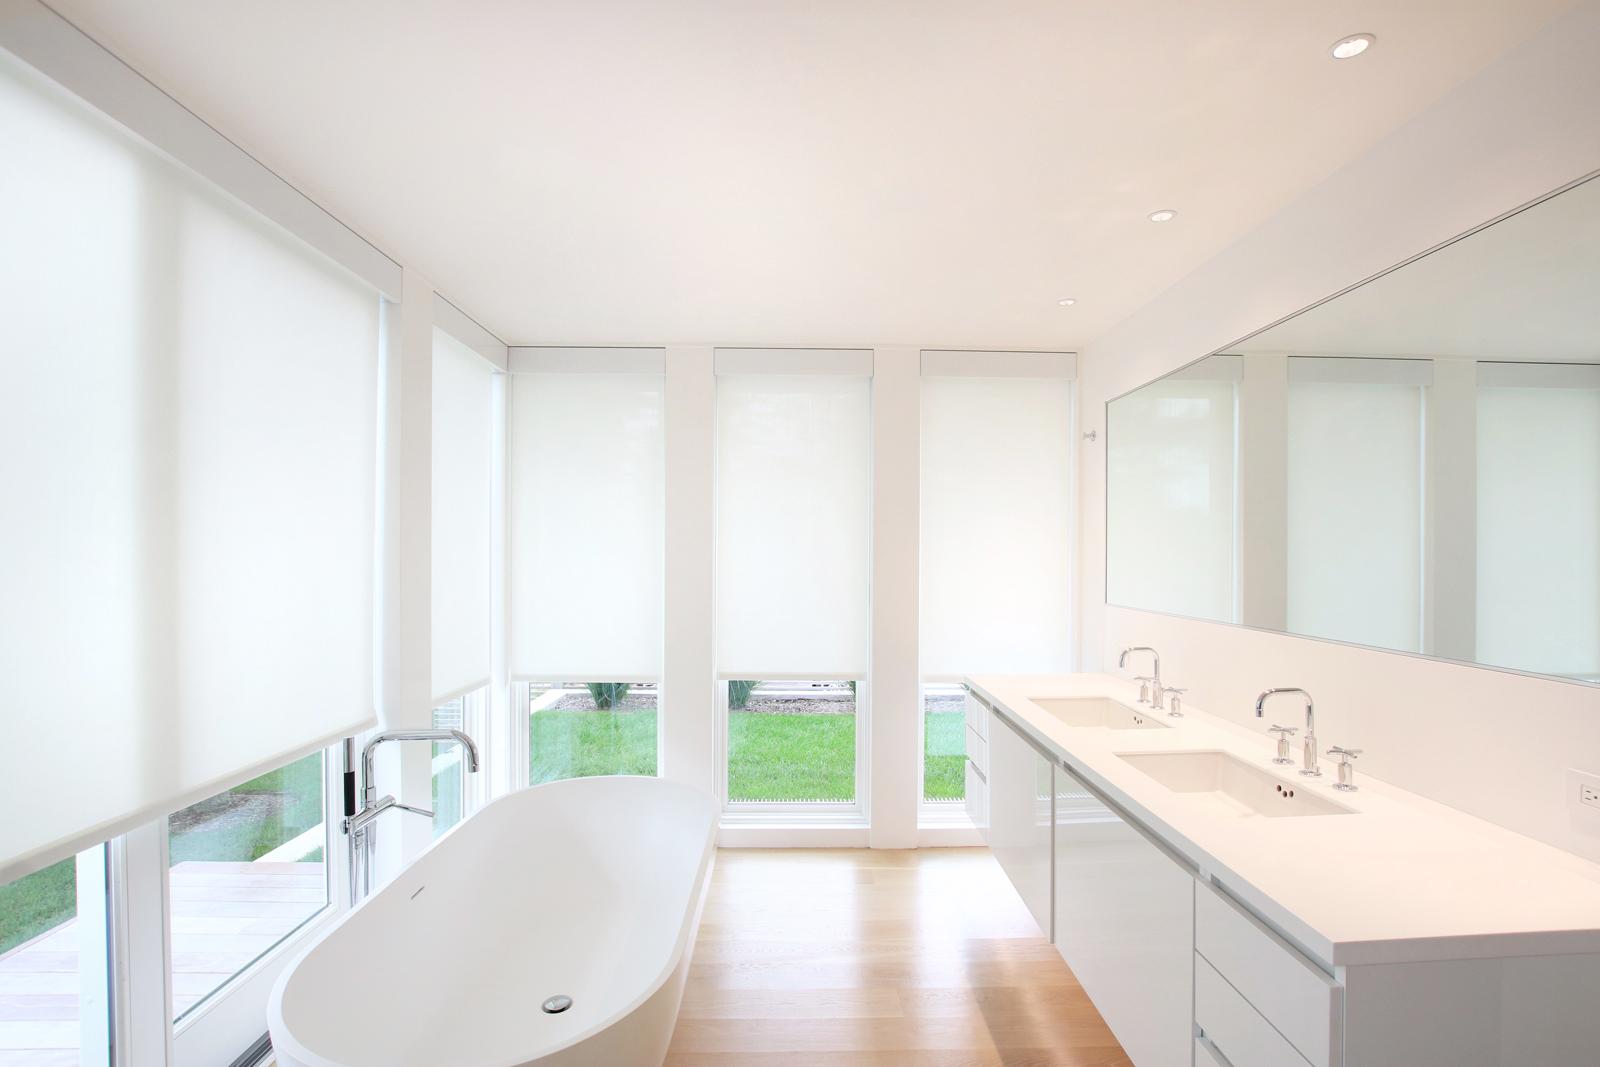 18-re4a-resolution-4-architecture-modern-modular-prefab-bridgehampton house-interior-master-bath-room-shades-closed.jpg